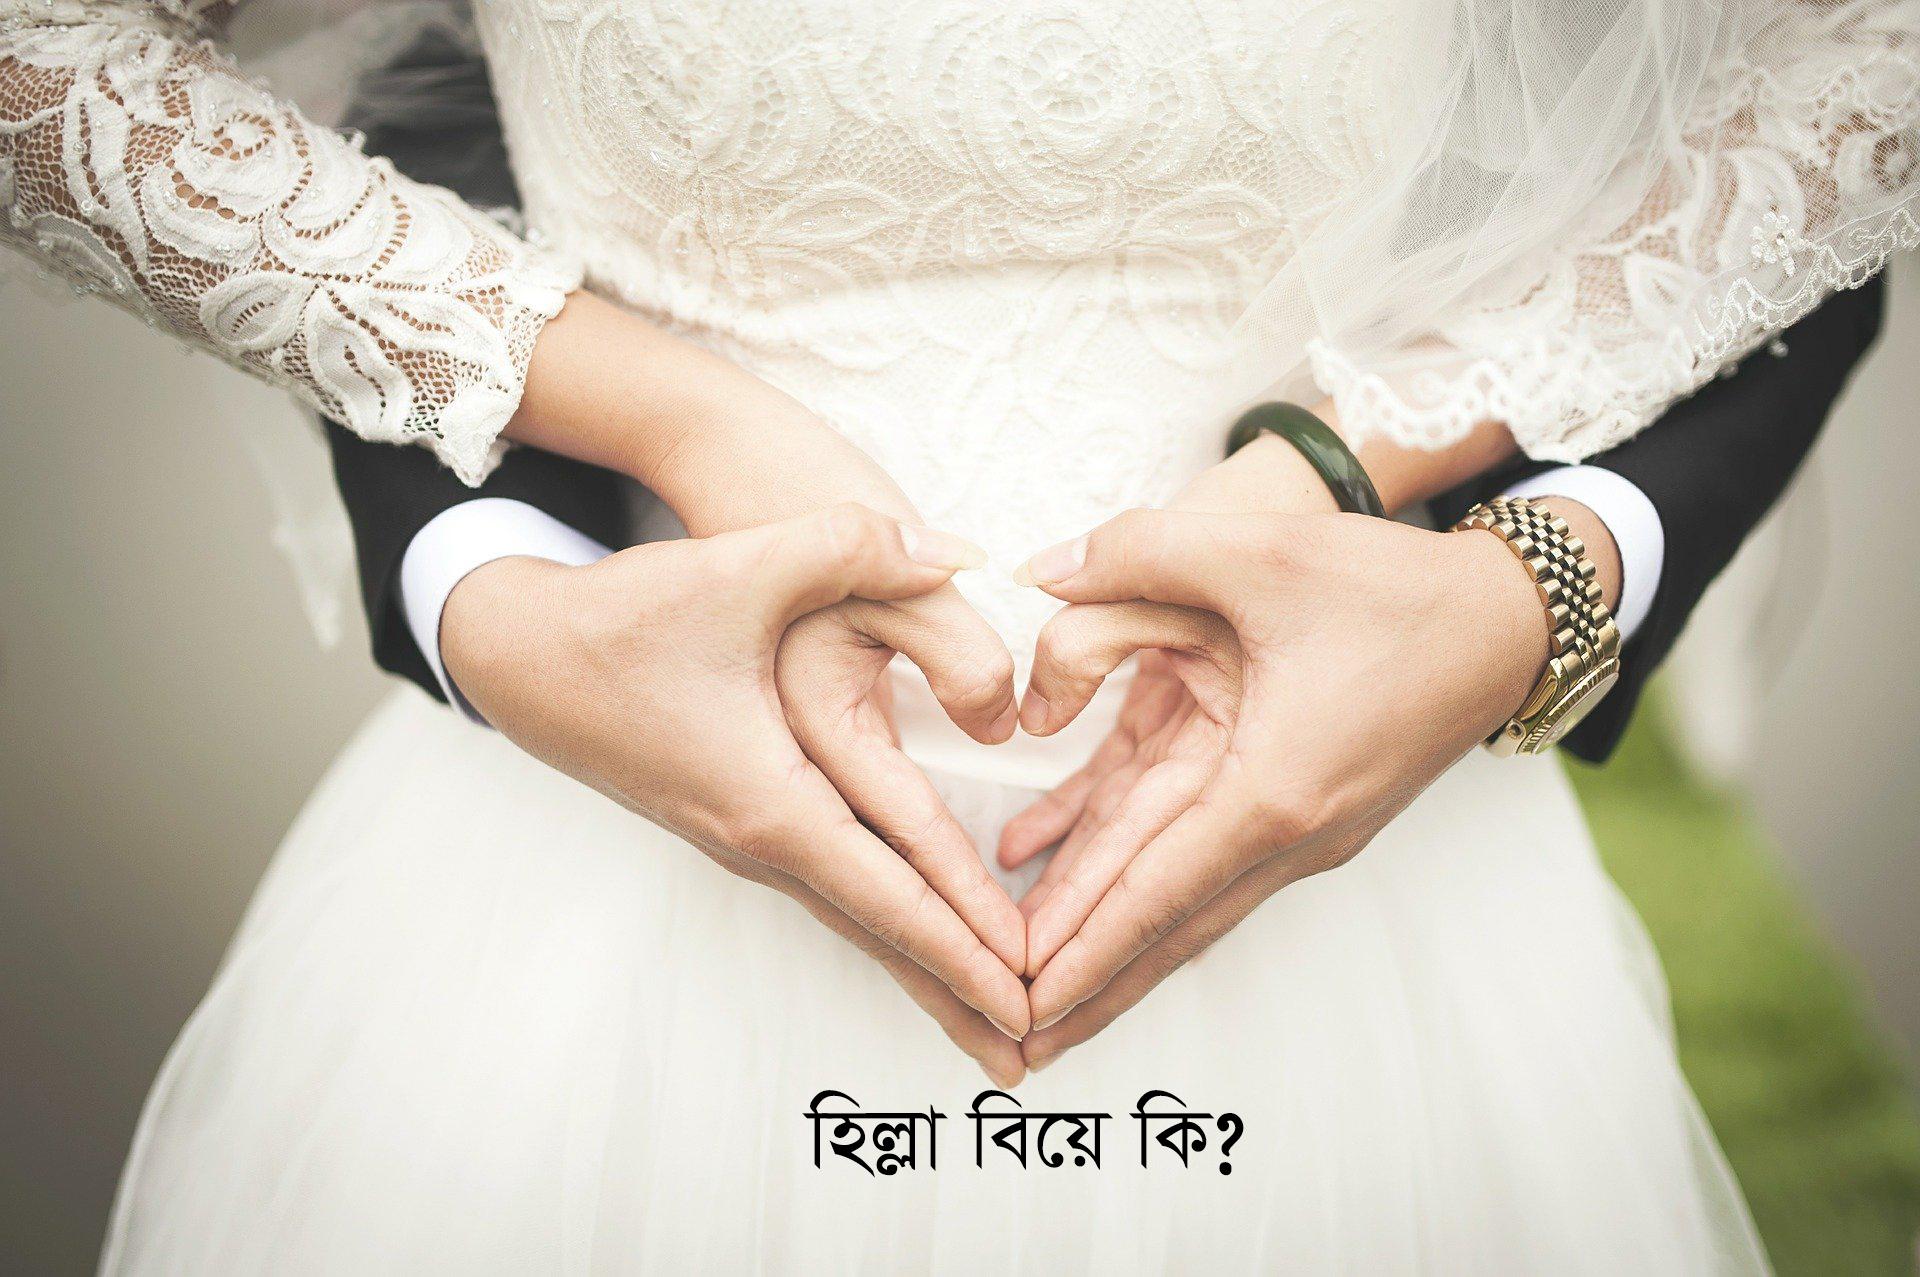 Intervening Marriage